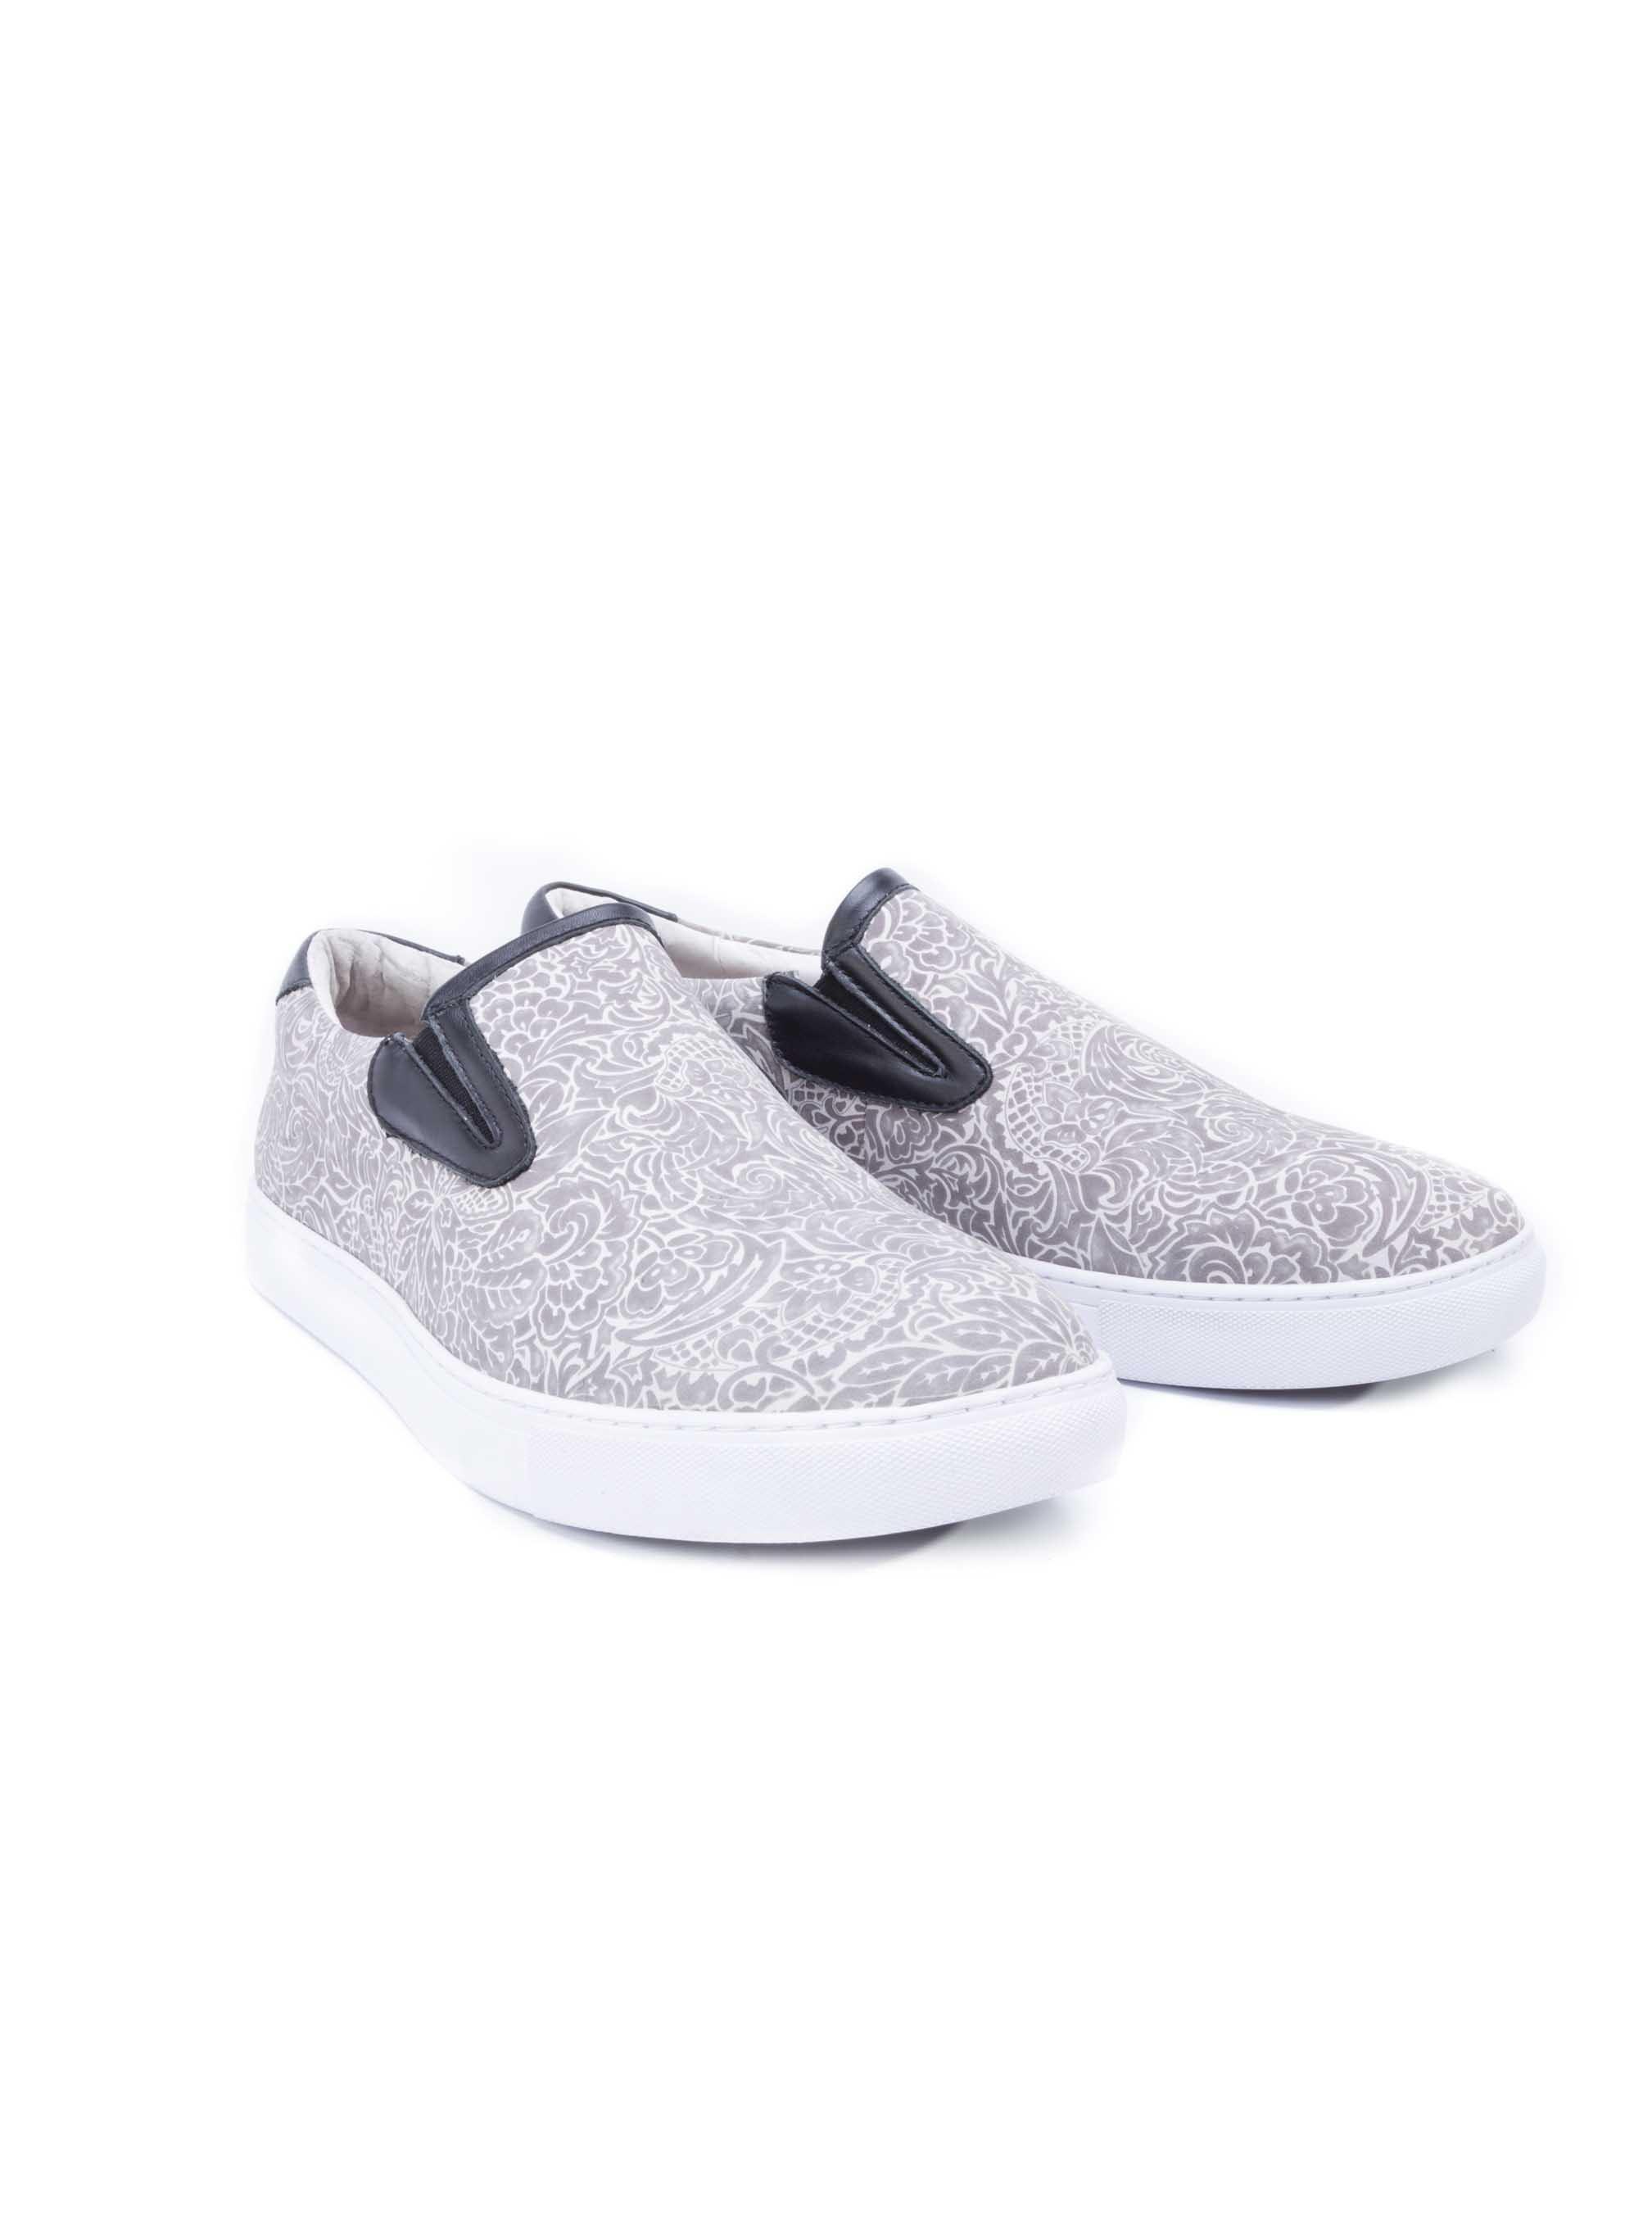 Robert Graham Estrada Slip-On Sneaker dPxR3MElV